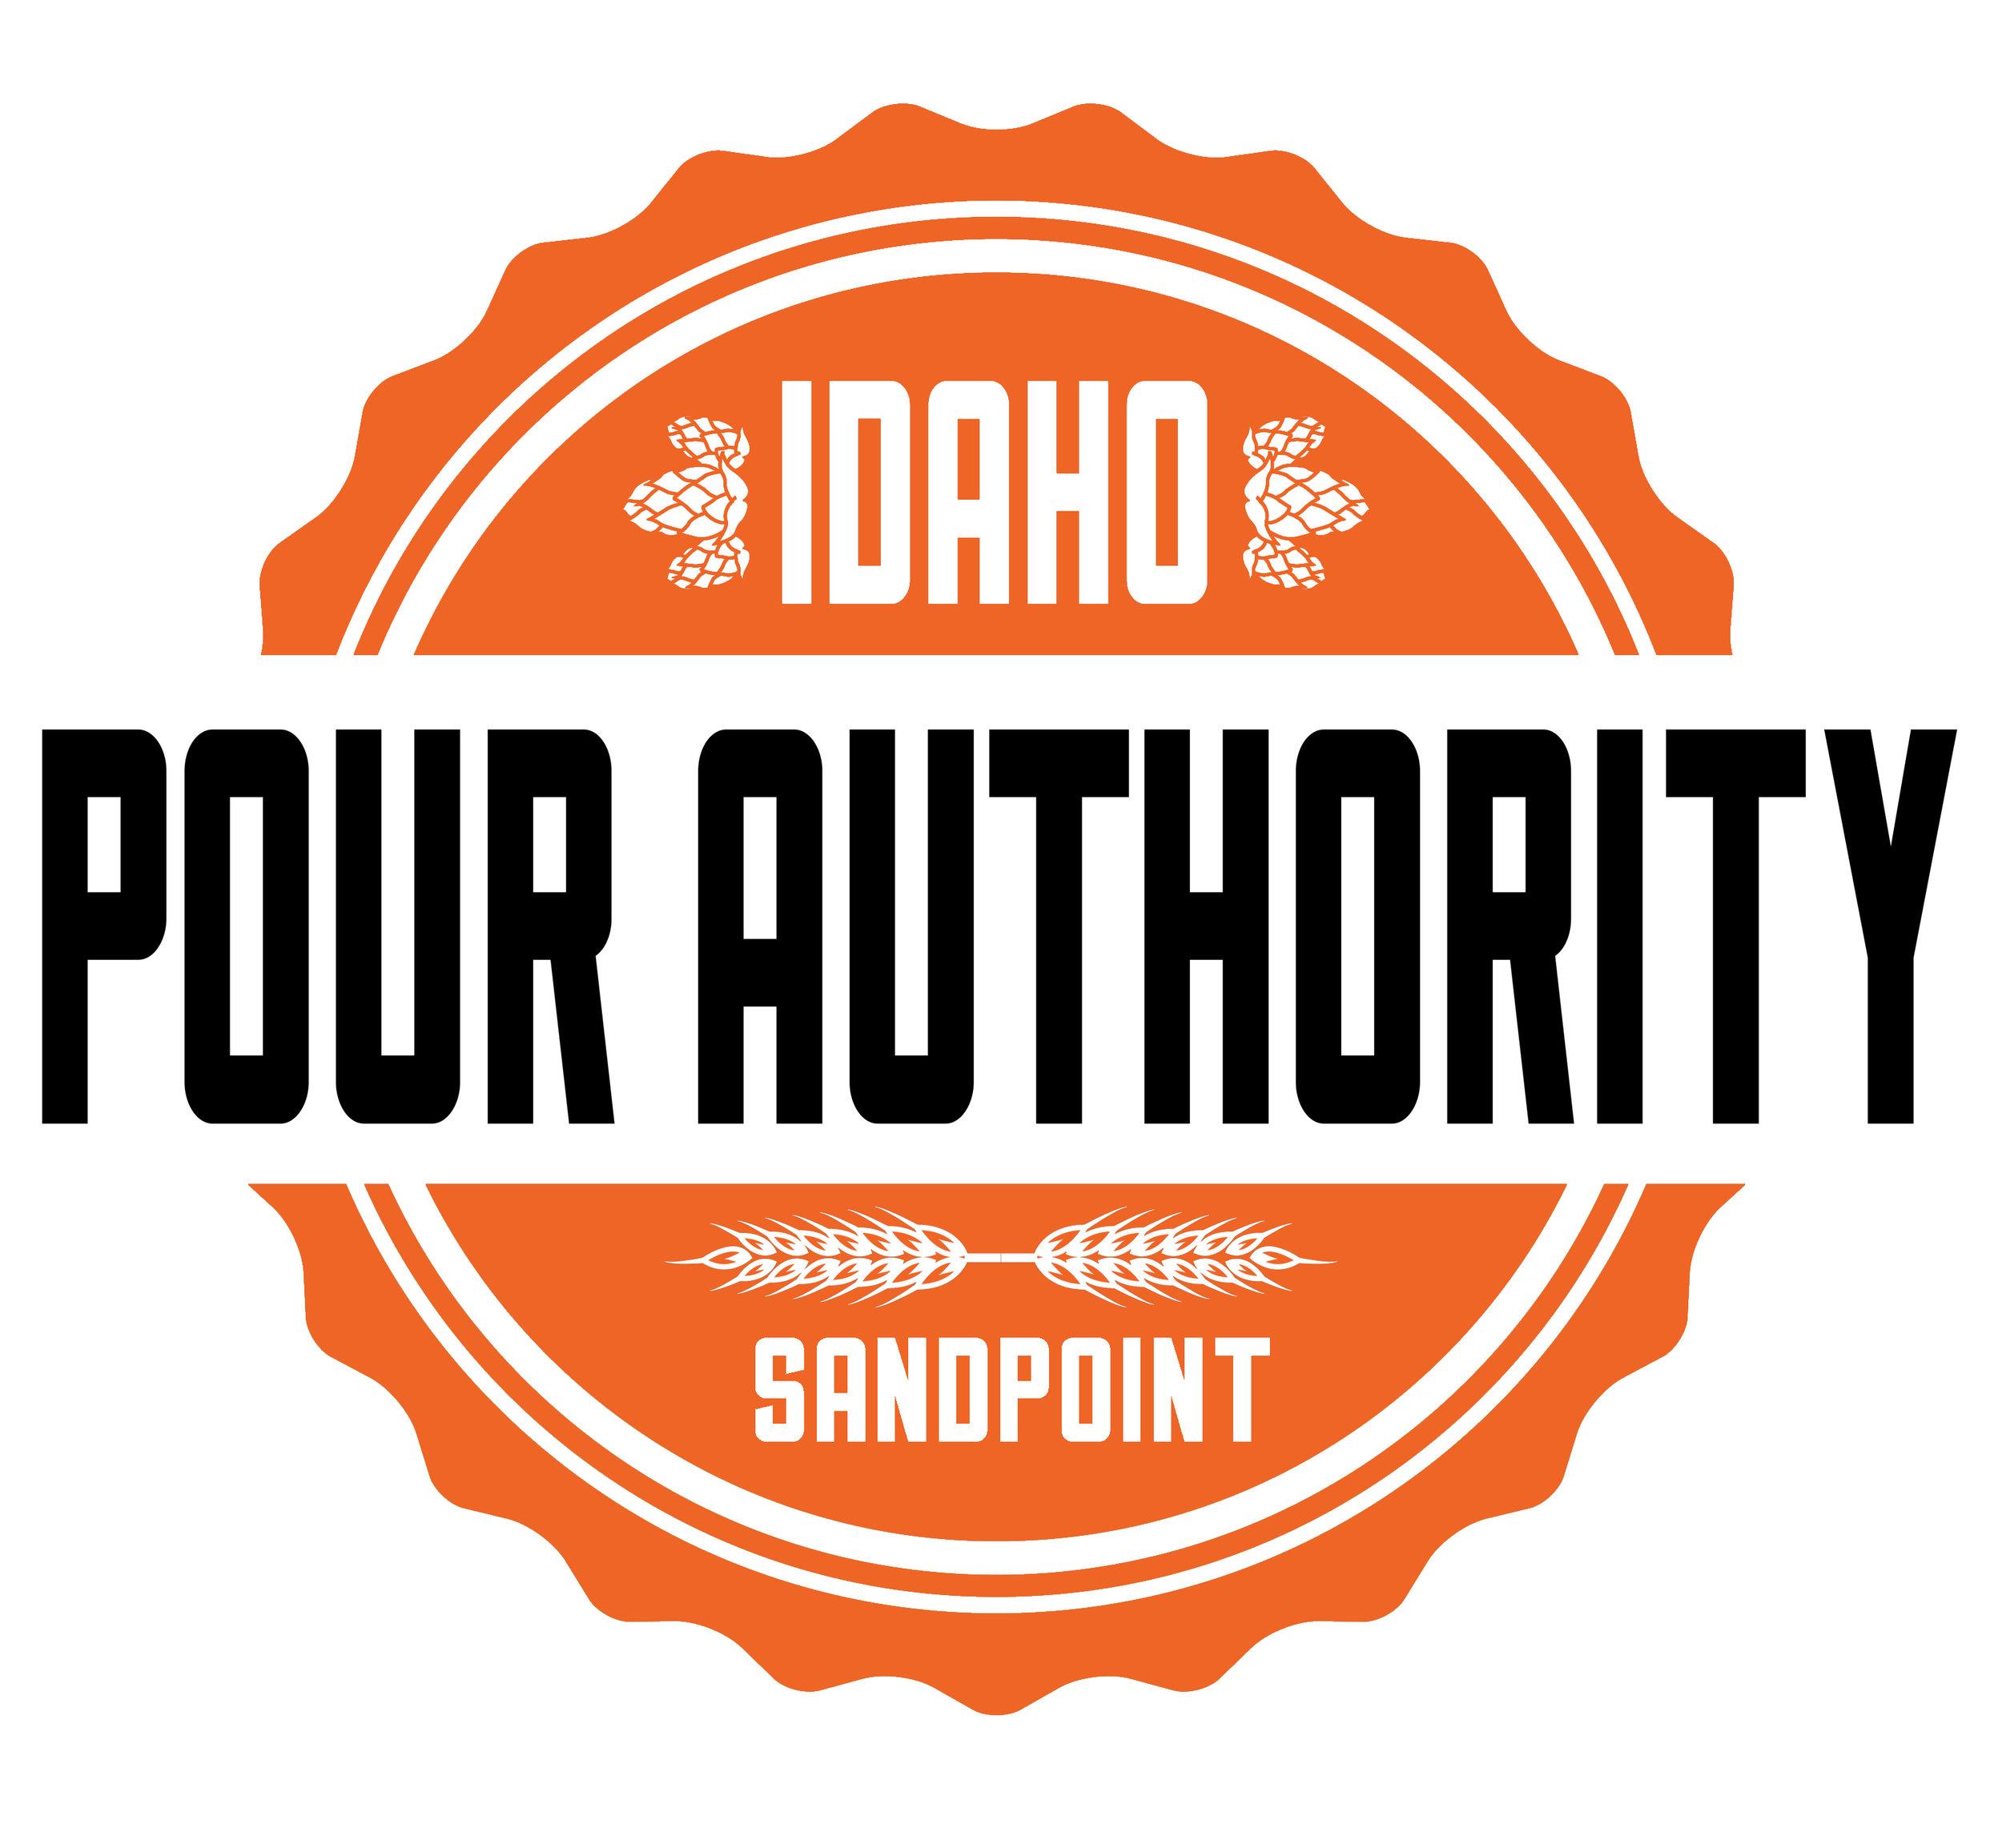 ipa_sandpoint-orange.jpg